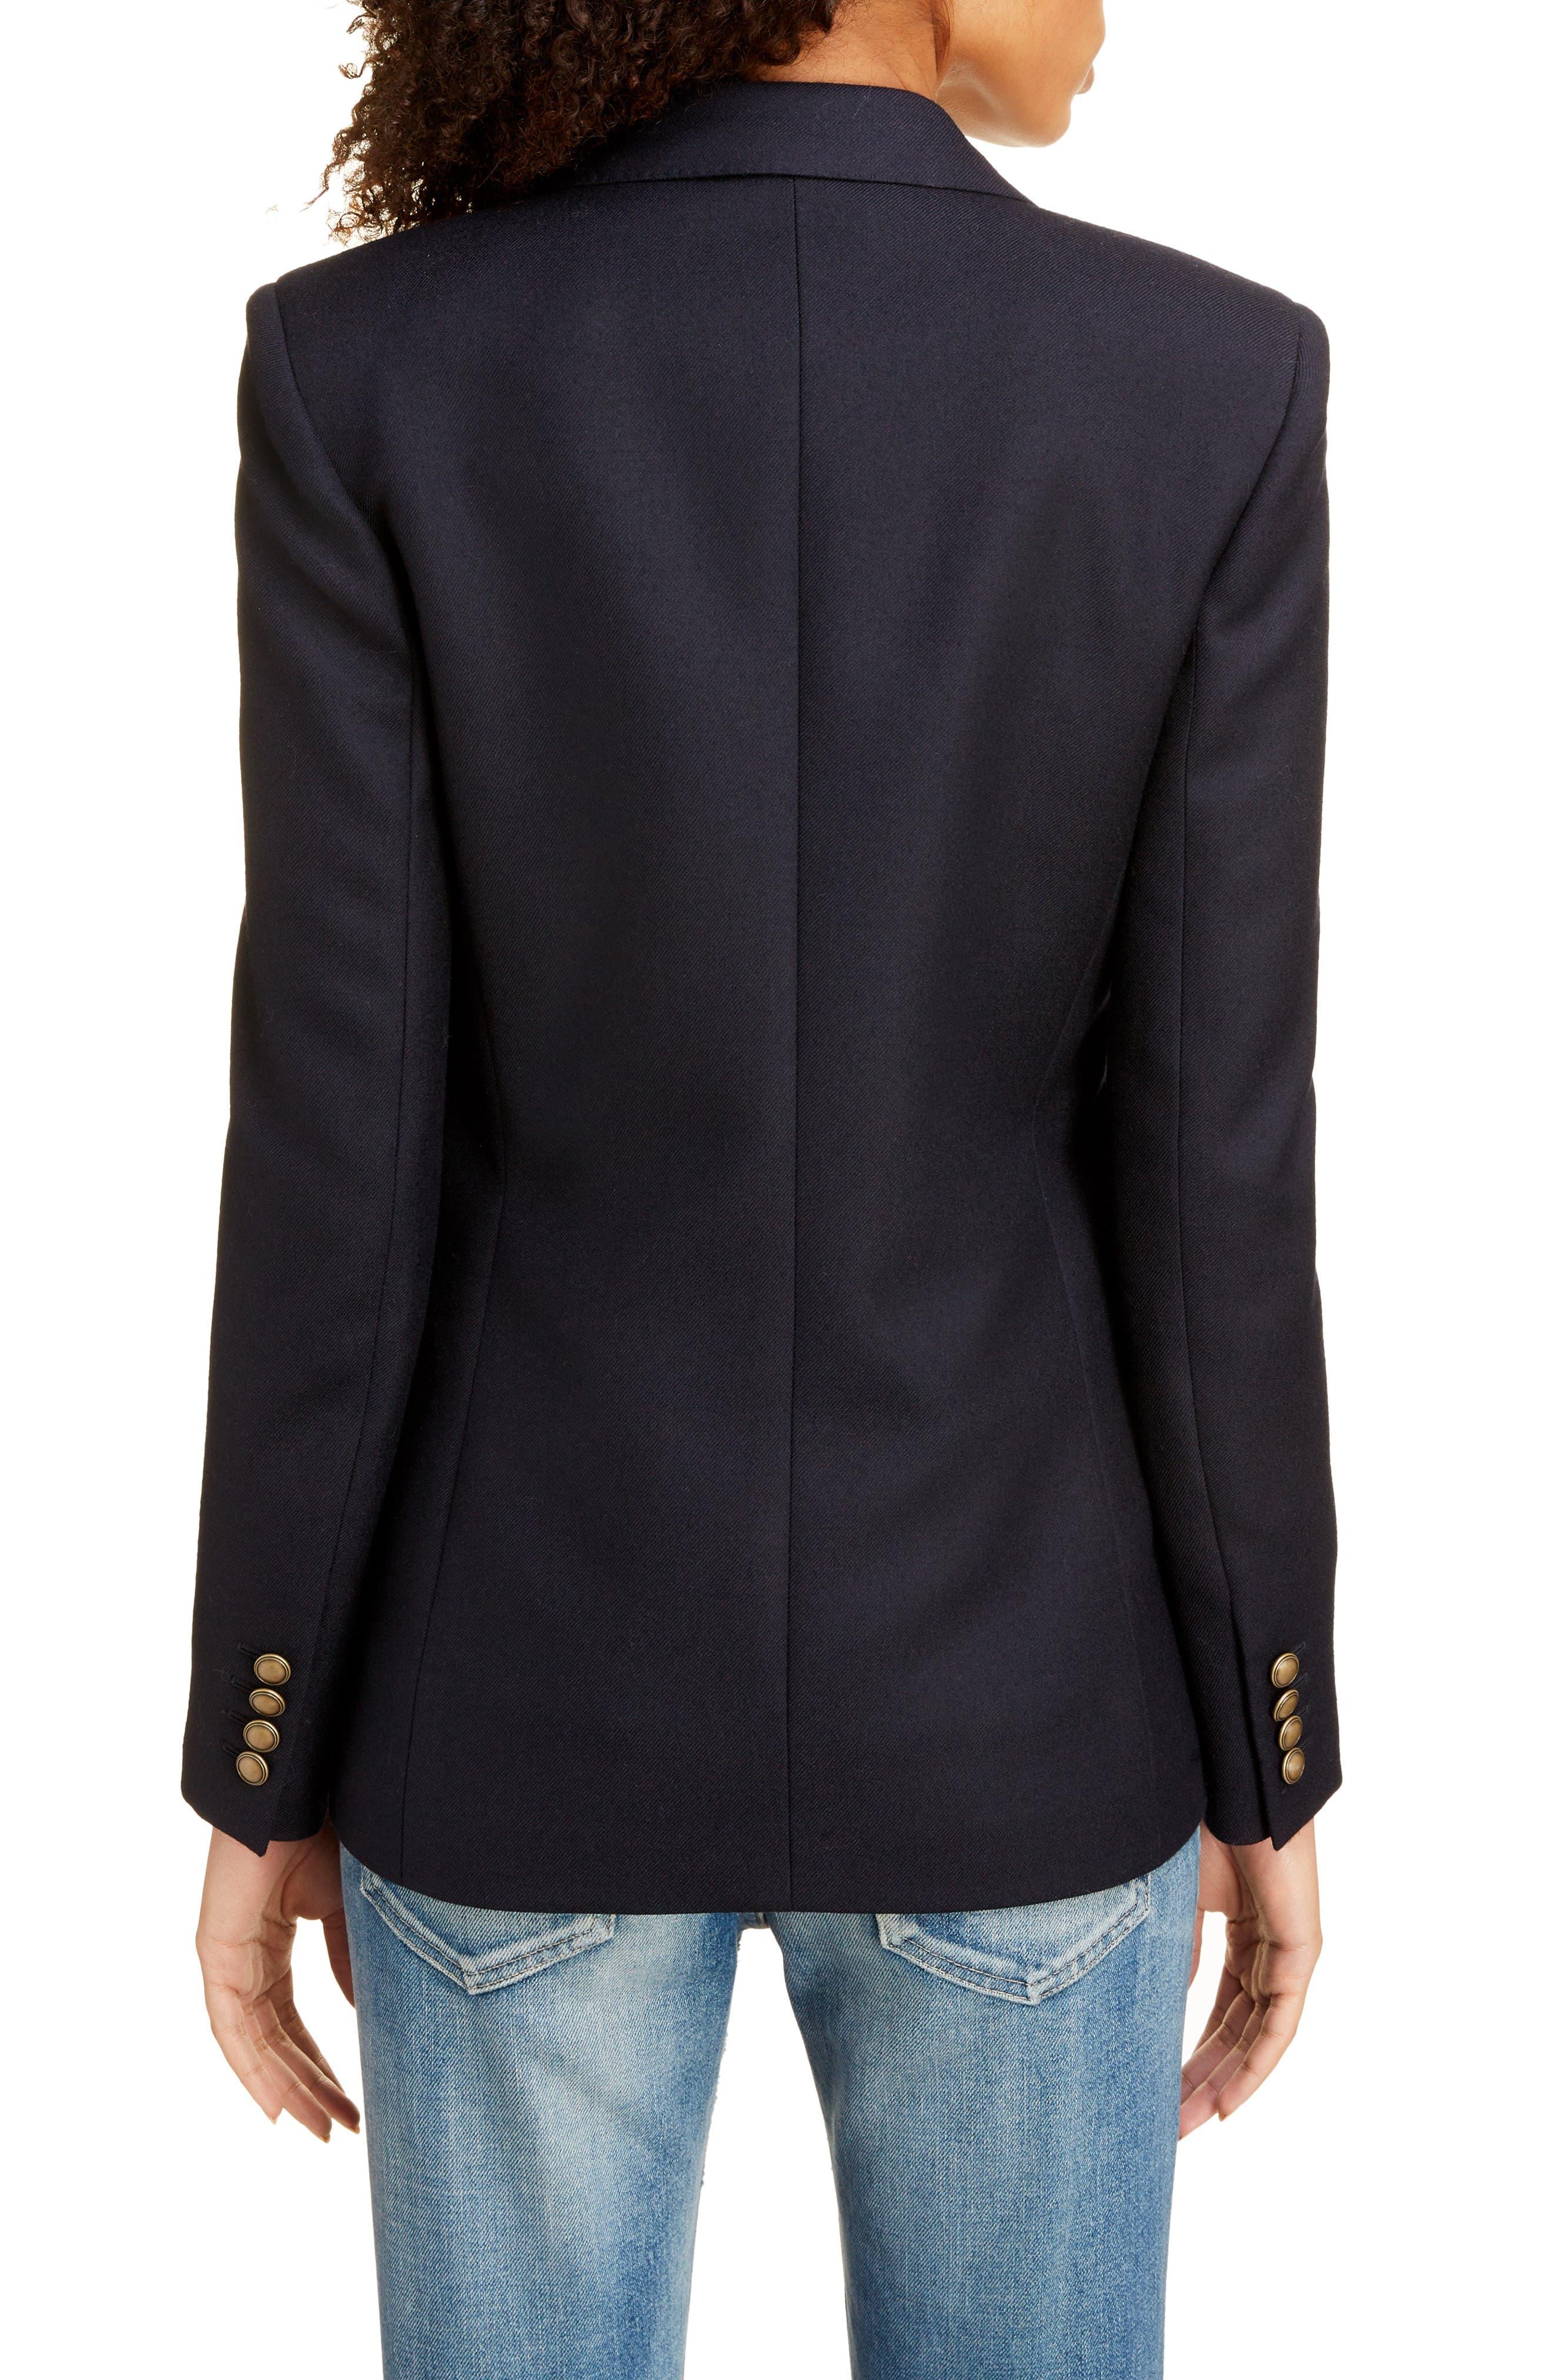 2d2a81102d1 Women's Saint Laurent Coats & Jackets | Nordstrom